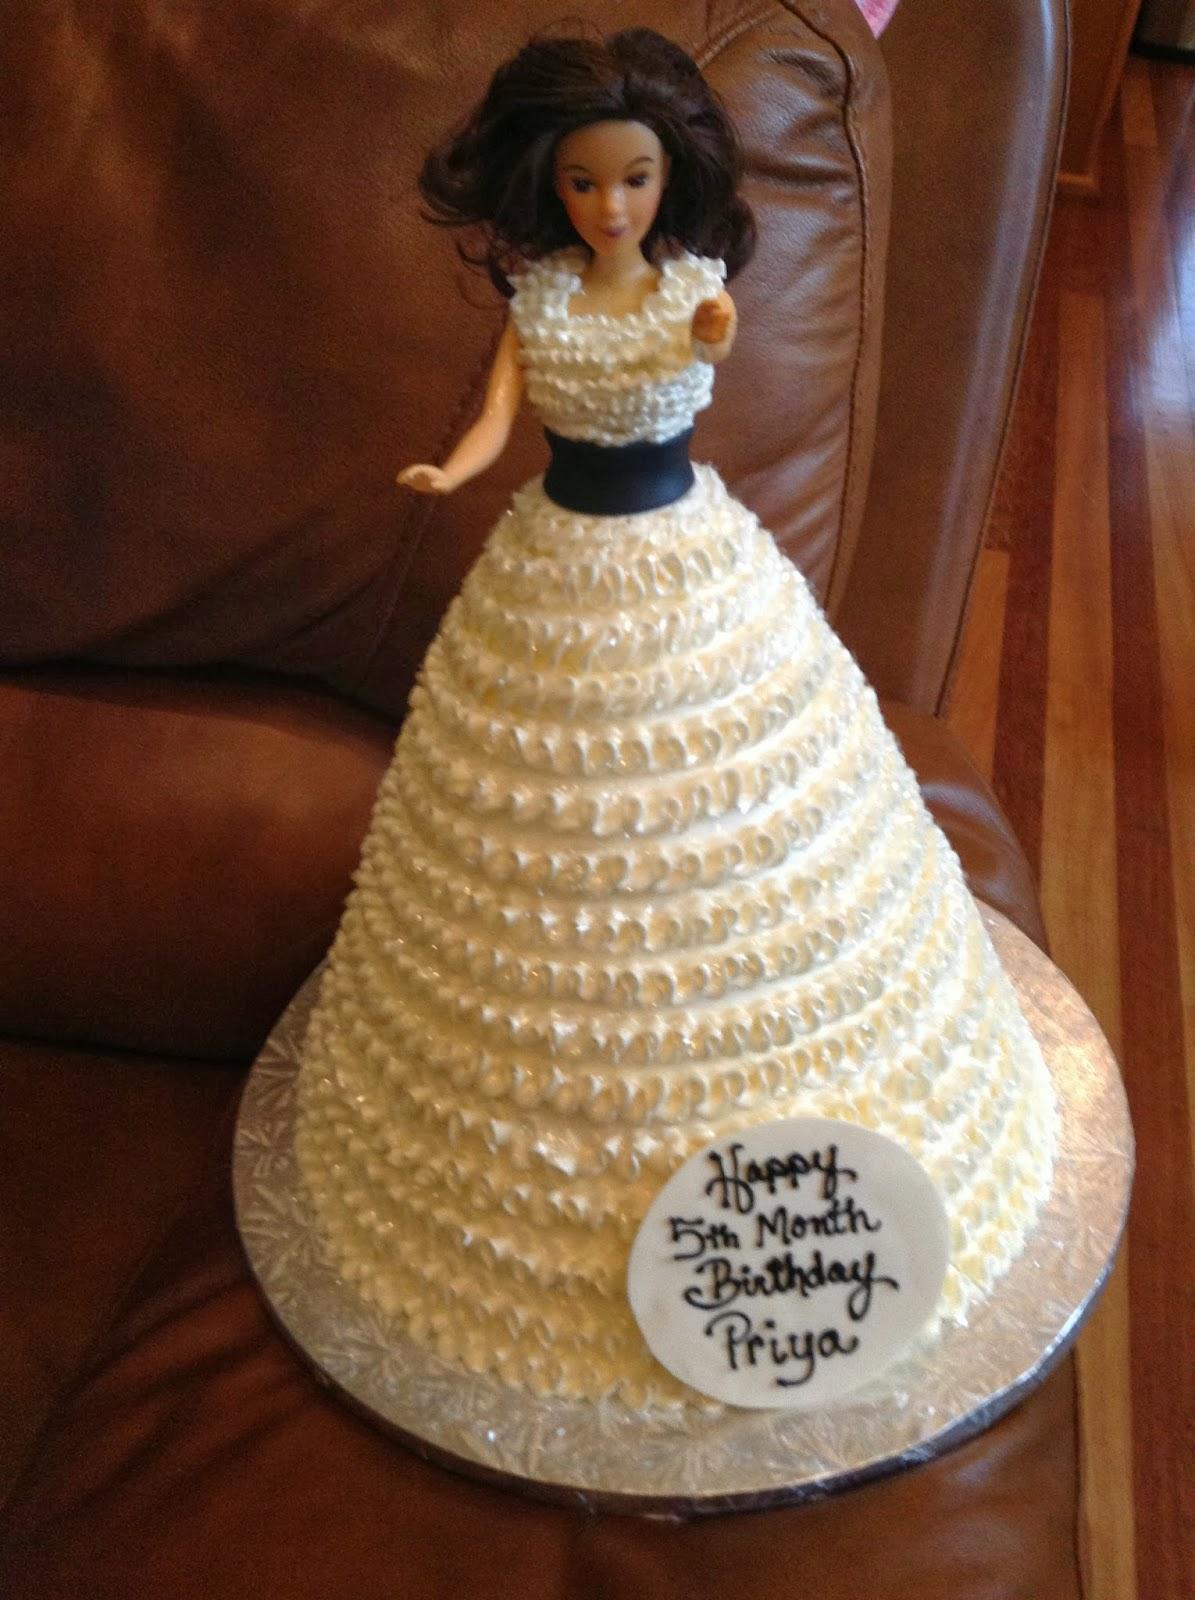 Cake Images For Priya : Vijay Madala, My Story: Priya 5th Month Birthday Cake